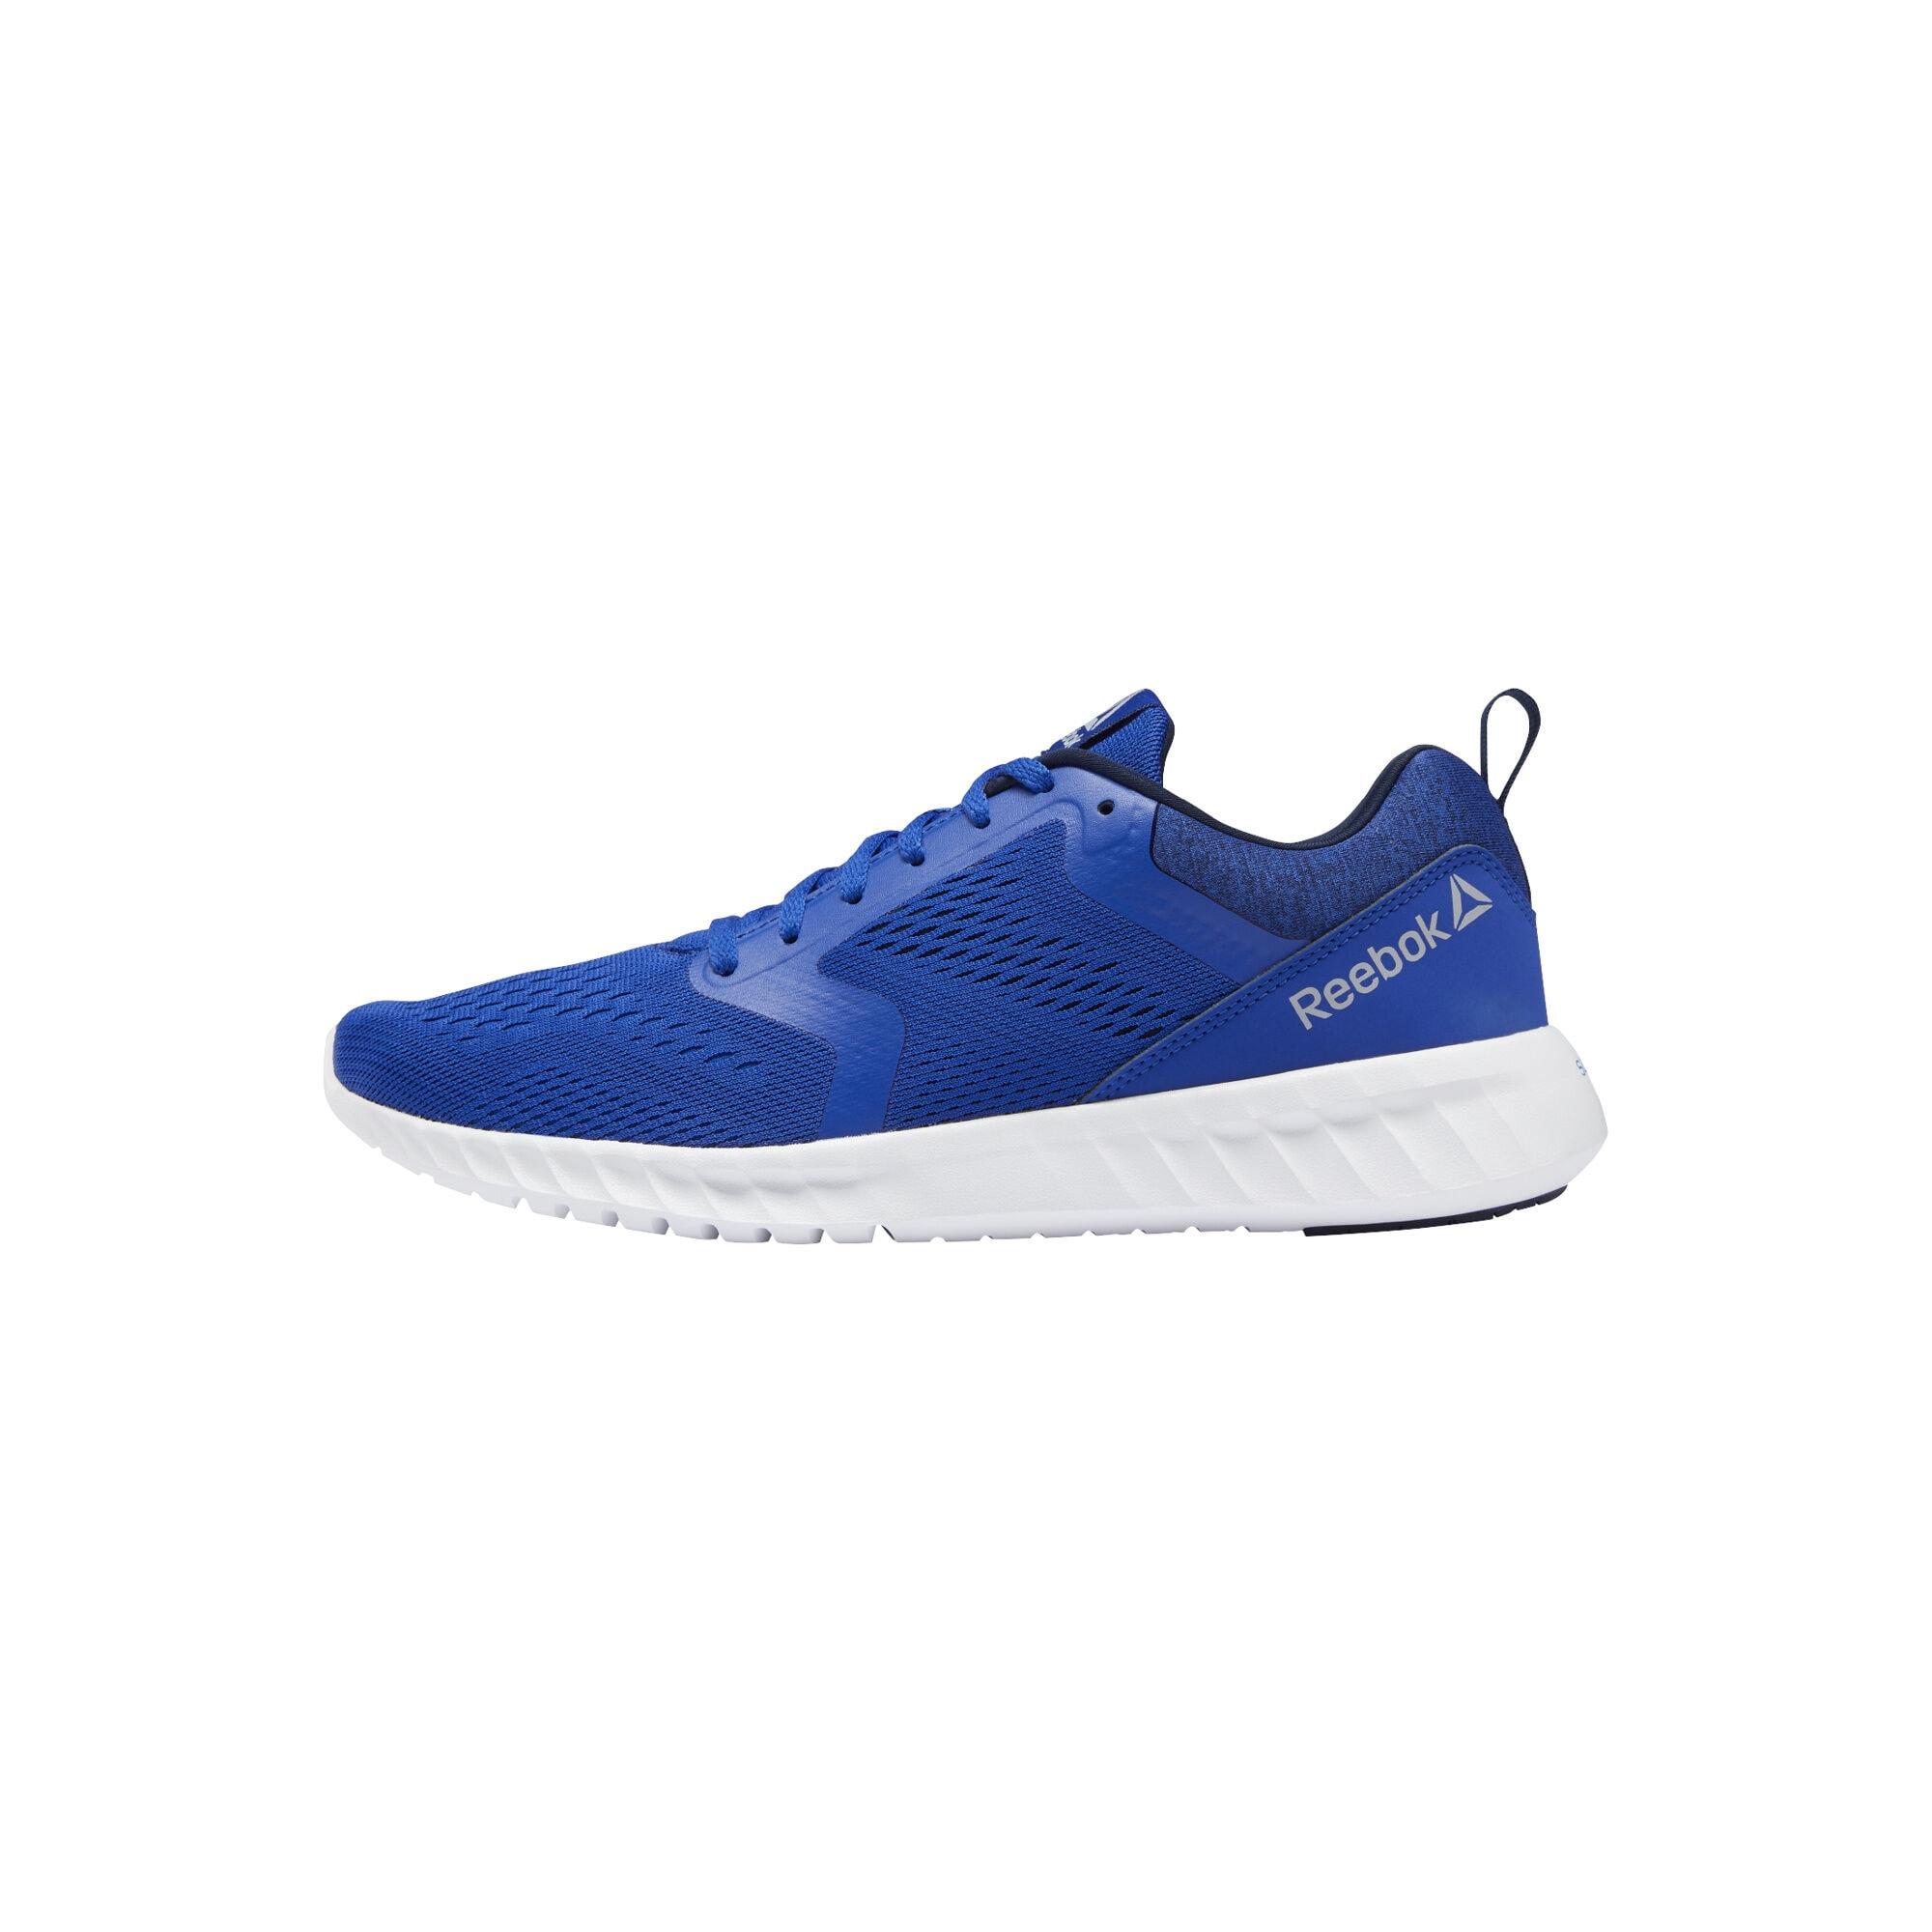 Laufschuhe 'Sublite Prime Shoes' | Schuhe > Sportschuhe > Laufschuhe | Blau | Reebok